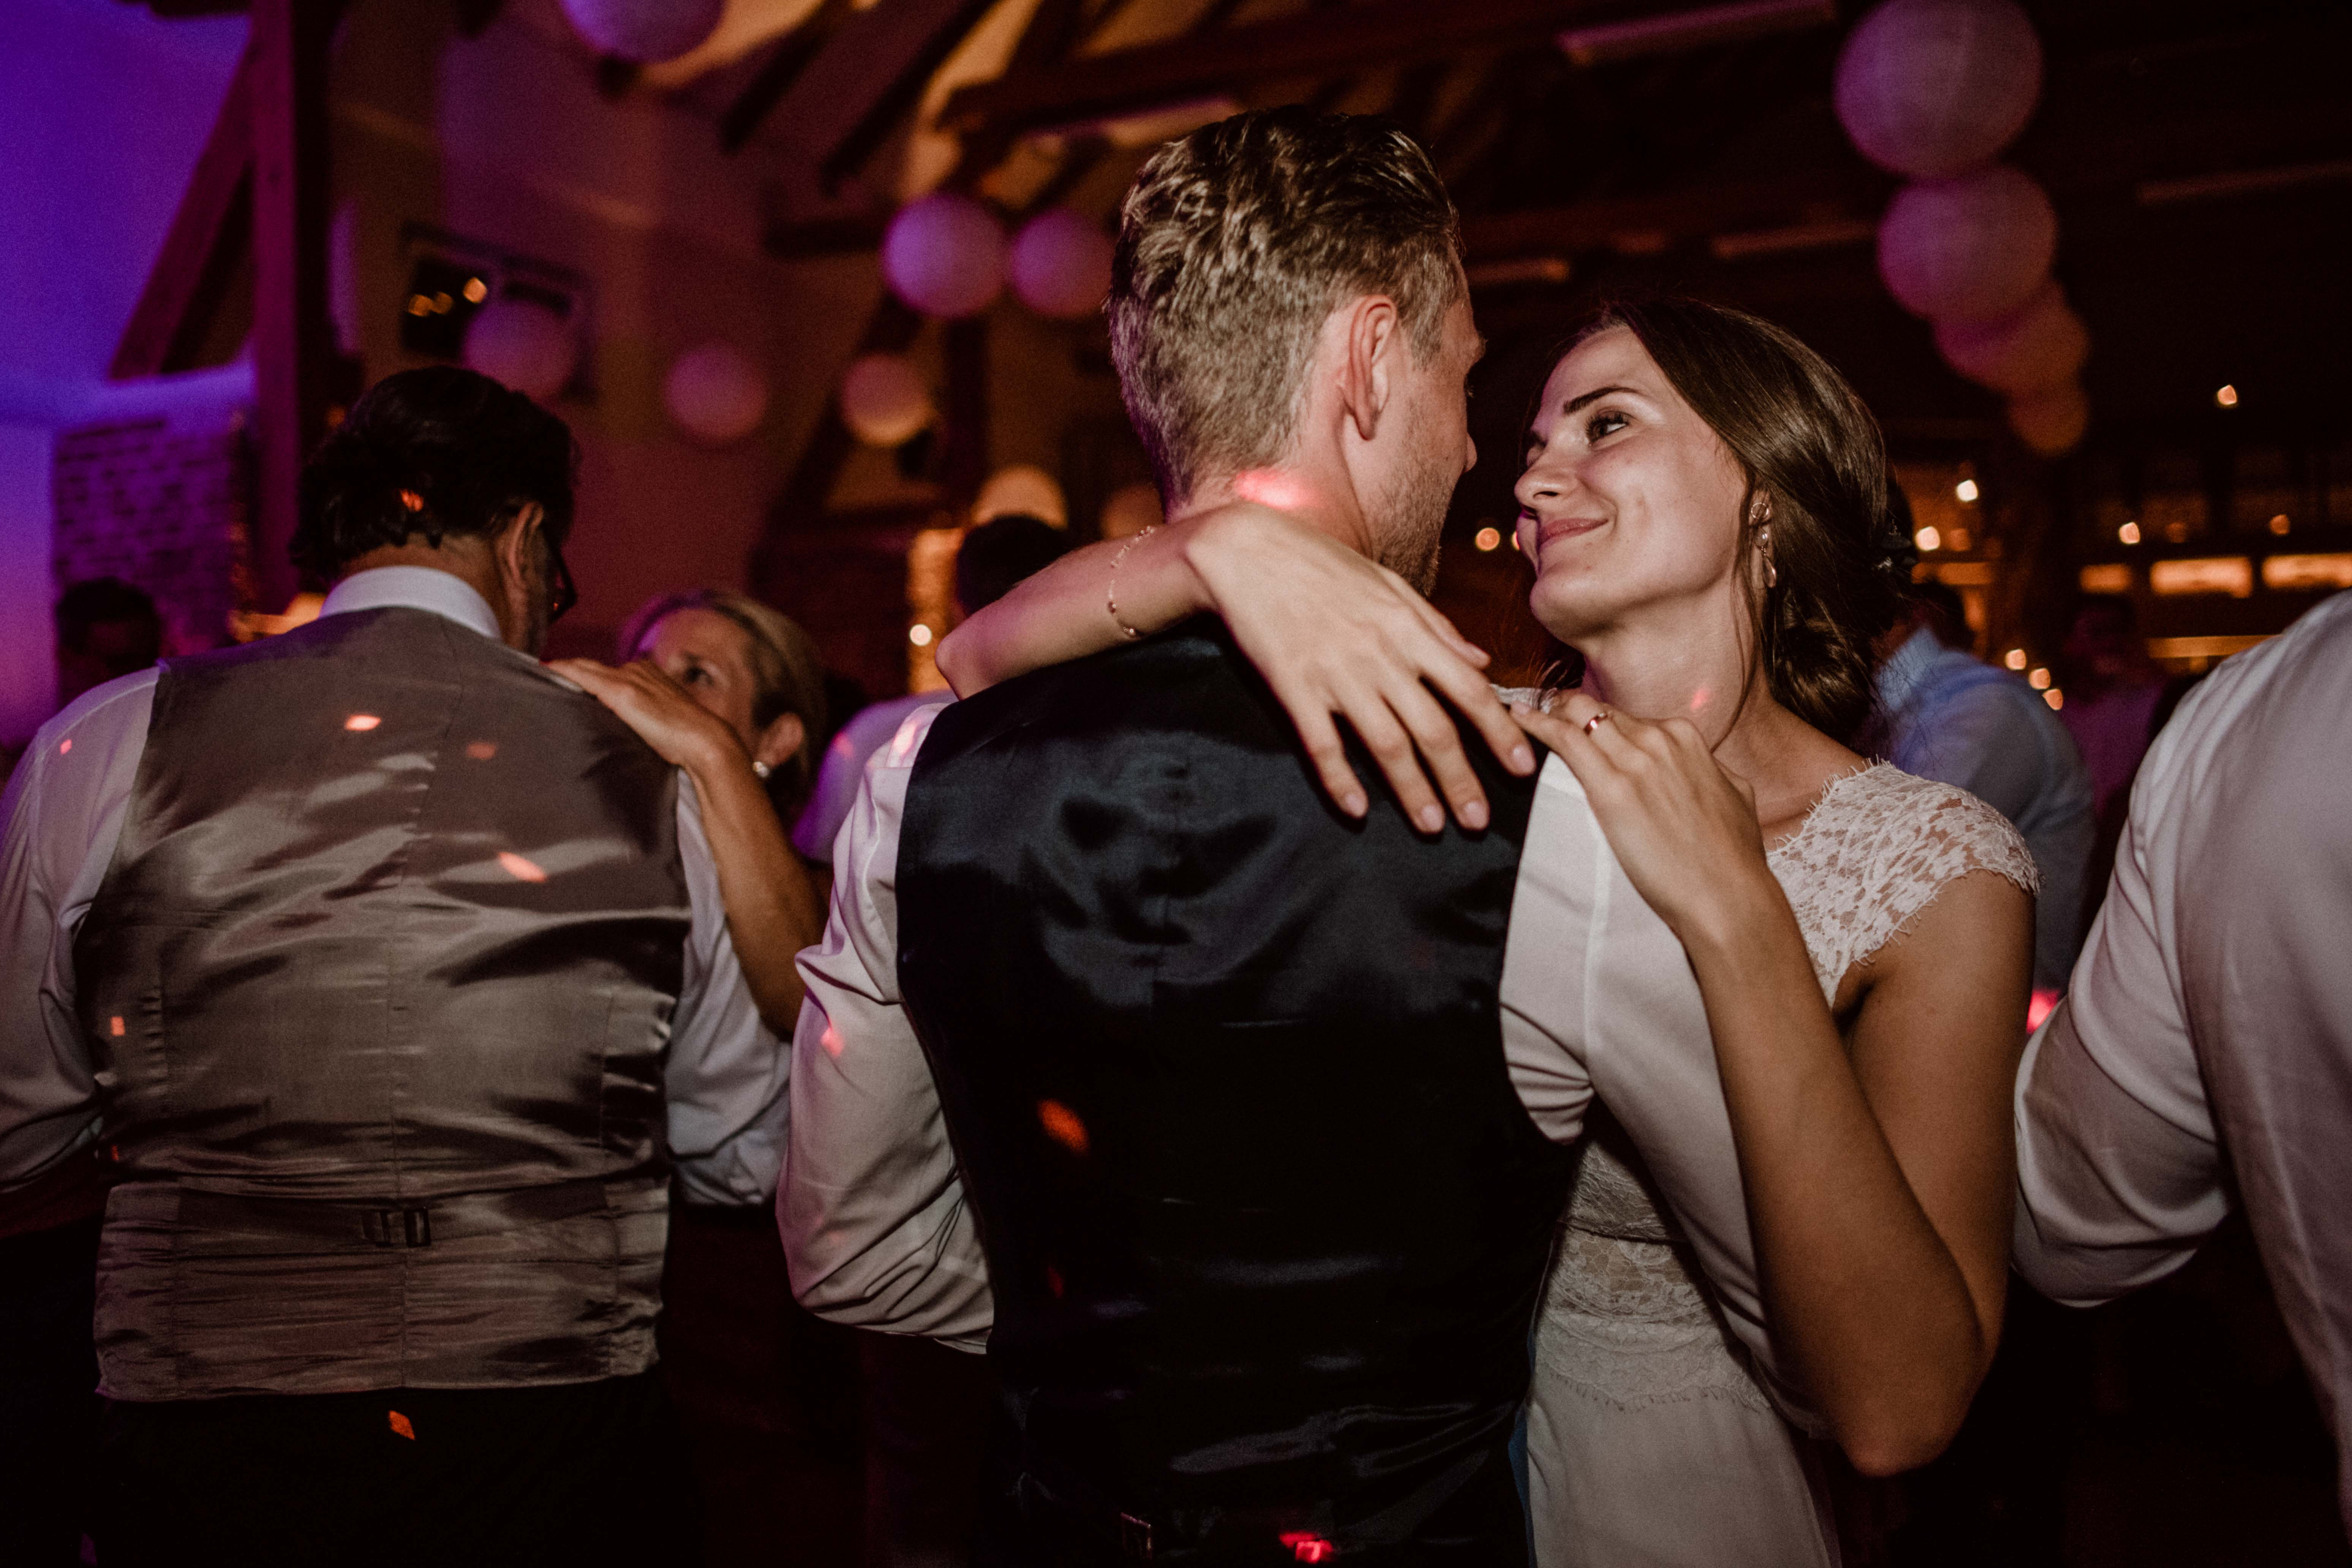 romantik tanzen sonja poehlmann photography wedding muenchen bayern